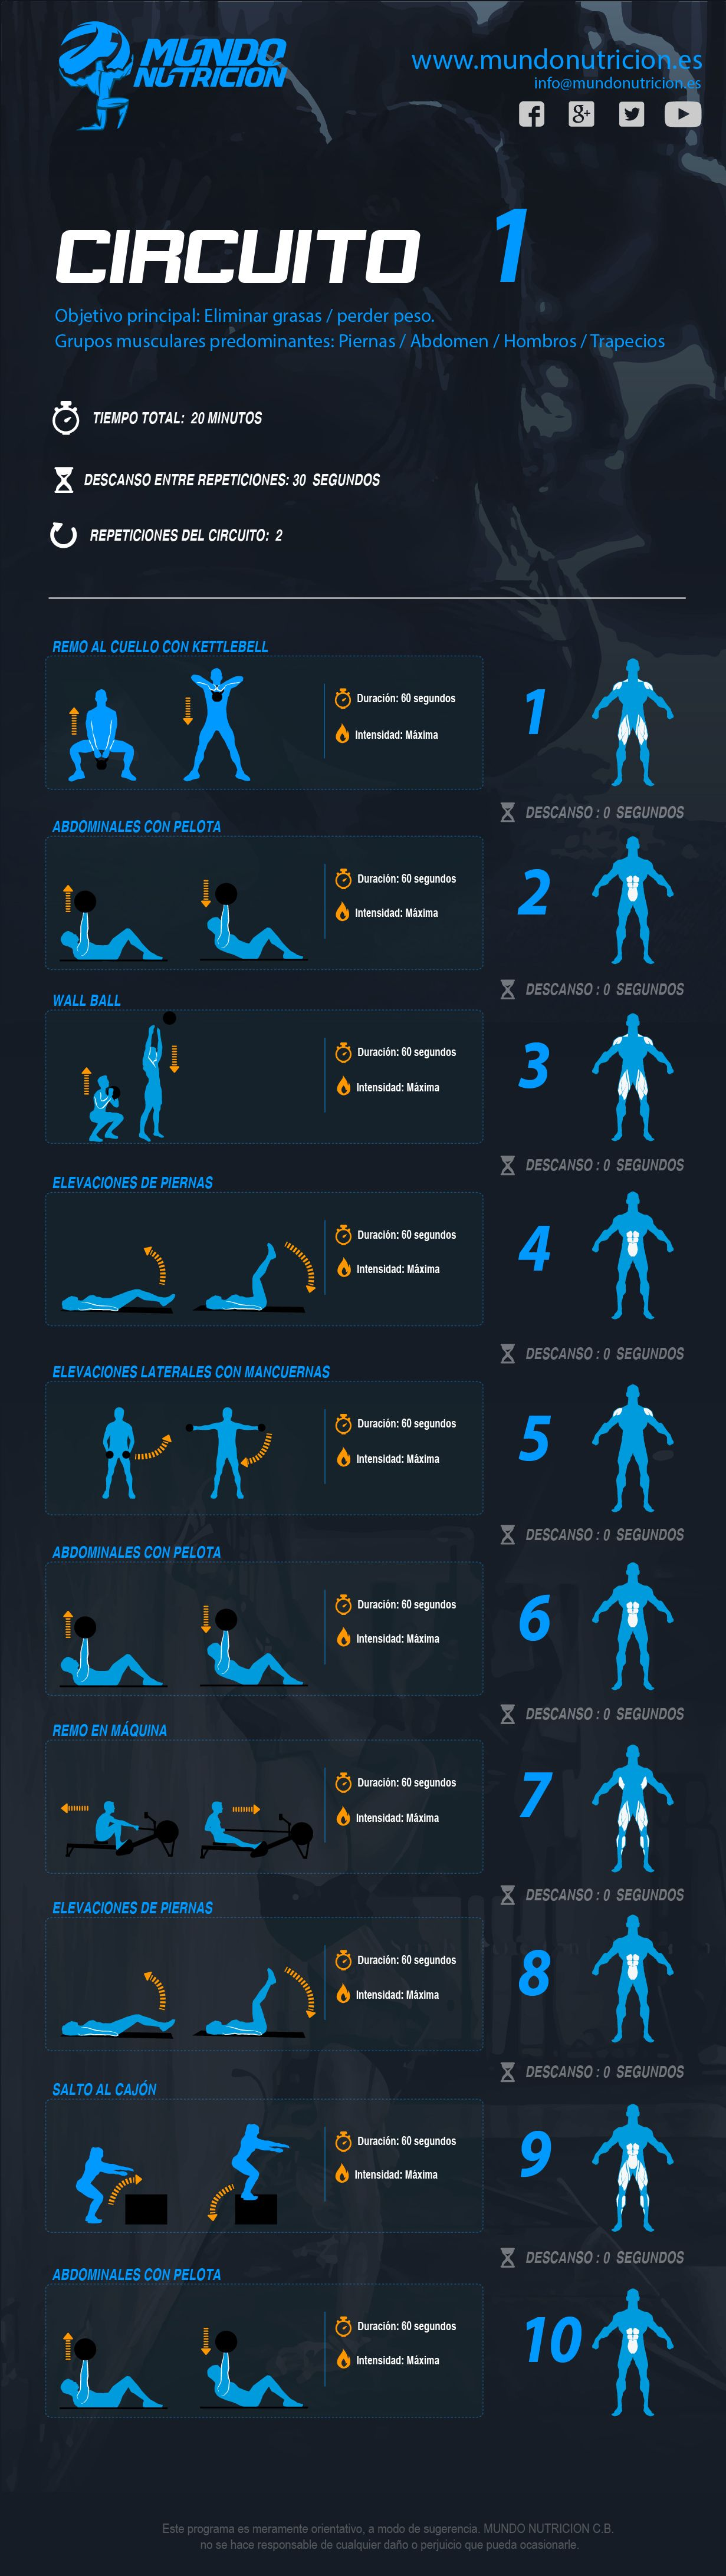 Circuito Gym : Deporcentro línea circuito funcional